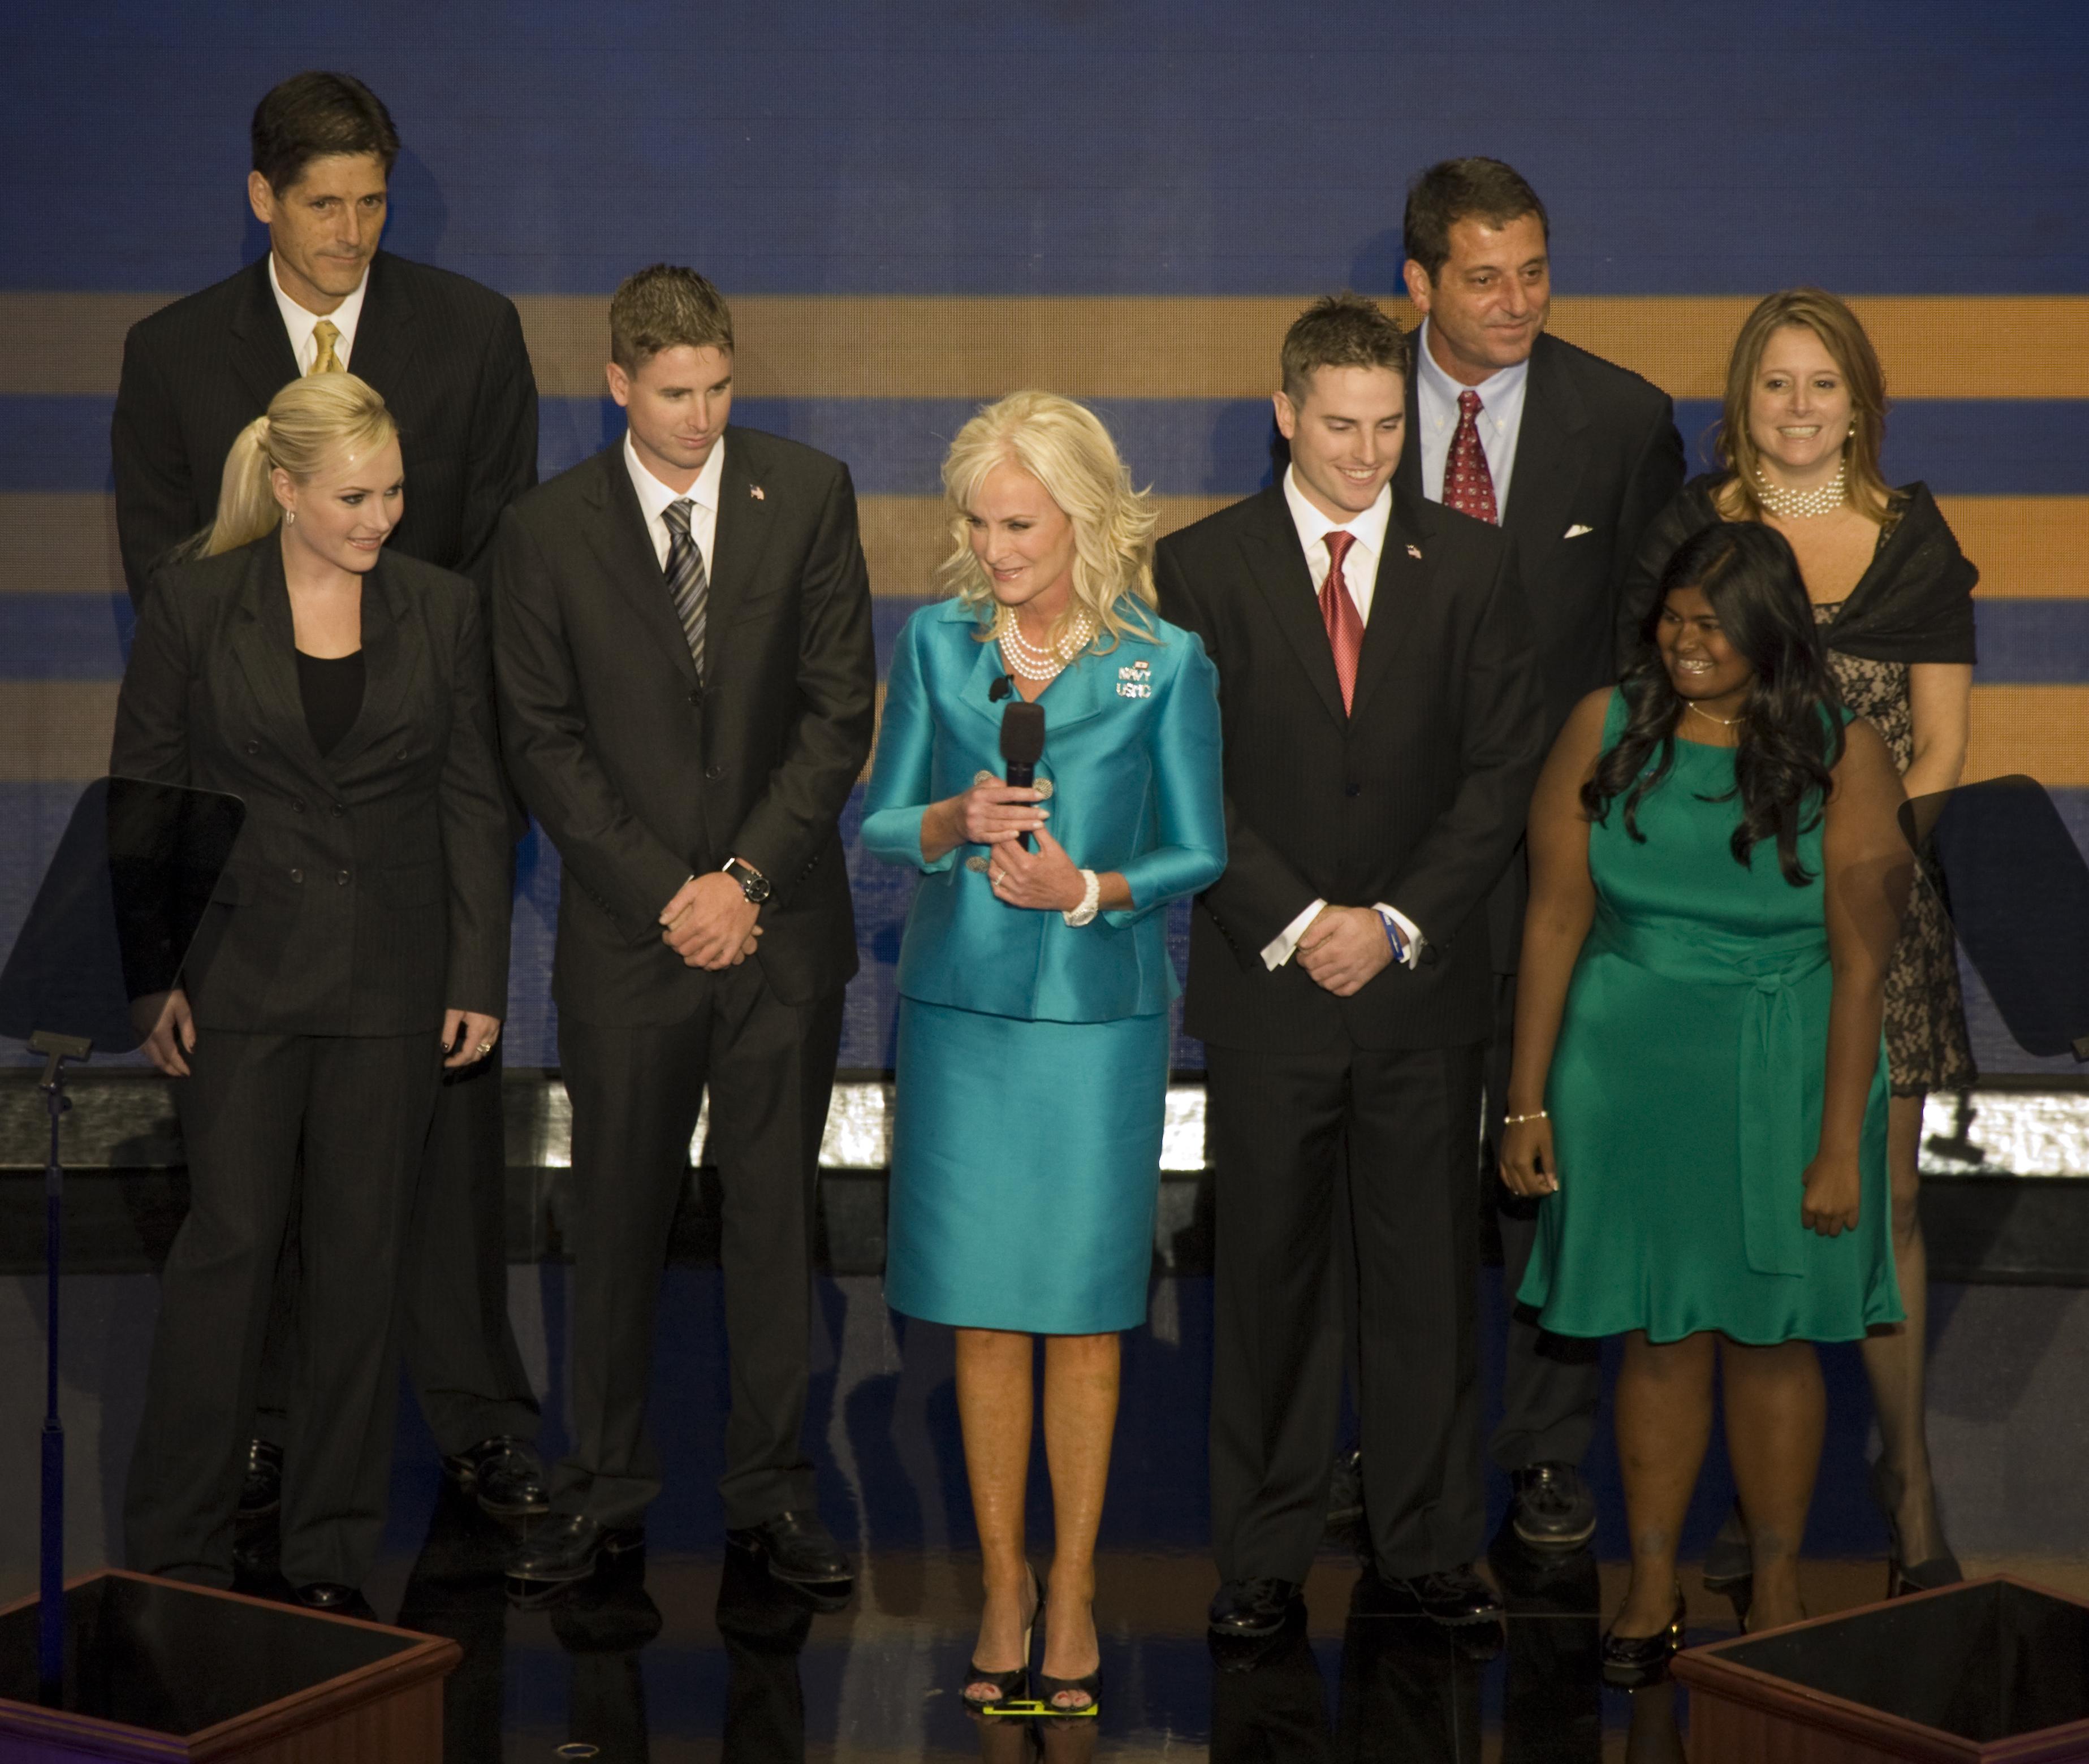 Bridget Mccain: File:Republican National Convention, September 1-4, 2008